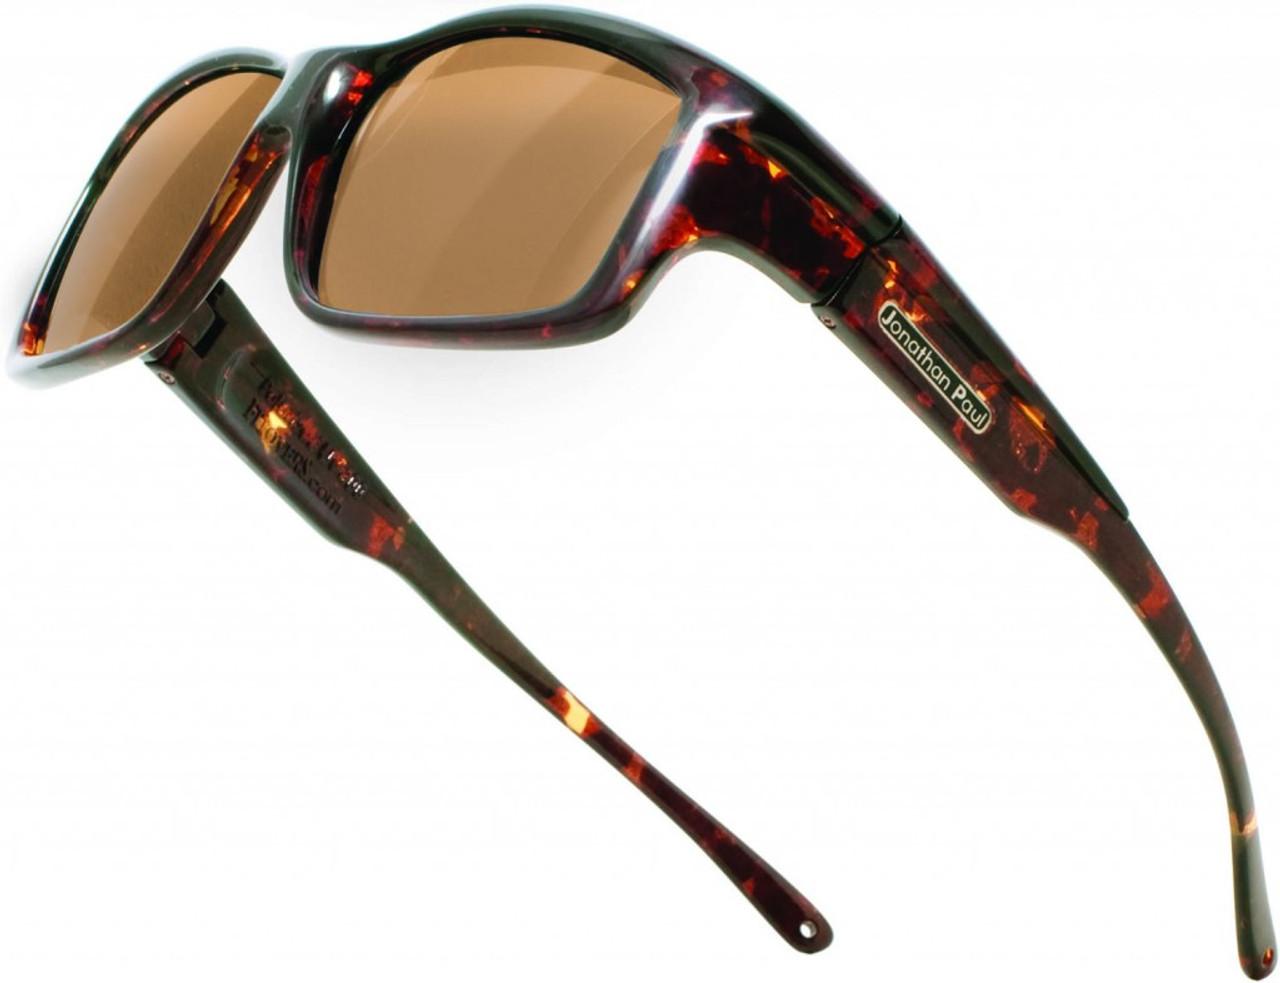 cec90c1a5616 Jonathan Paul® Fitovers Eyewear X-Large Yamba in Dark-Tortoise & Amber  YM003A